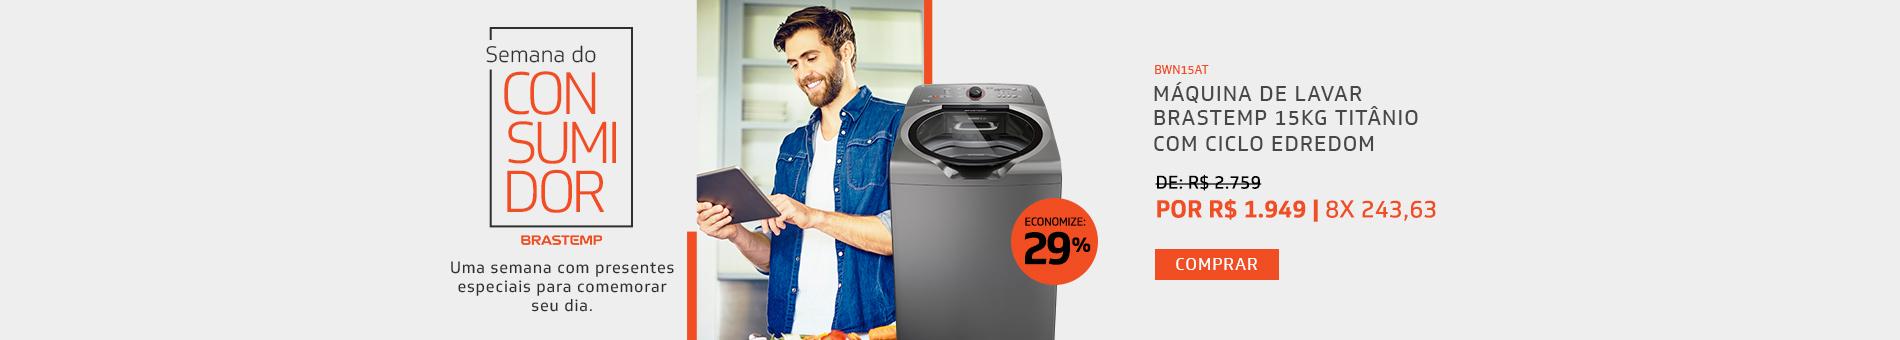 Promoção Interna - 2896 - campanha-semana-consumidor_BDD85AE-forno-preco_11032019_home5 - BDD85AE-forno-preco - 5